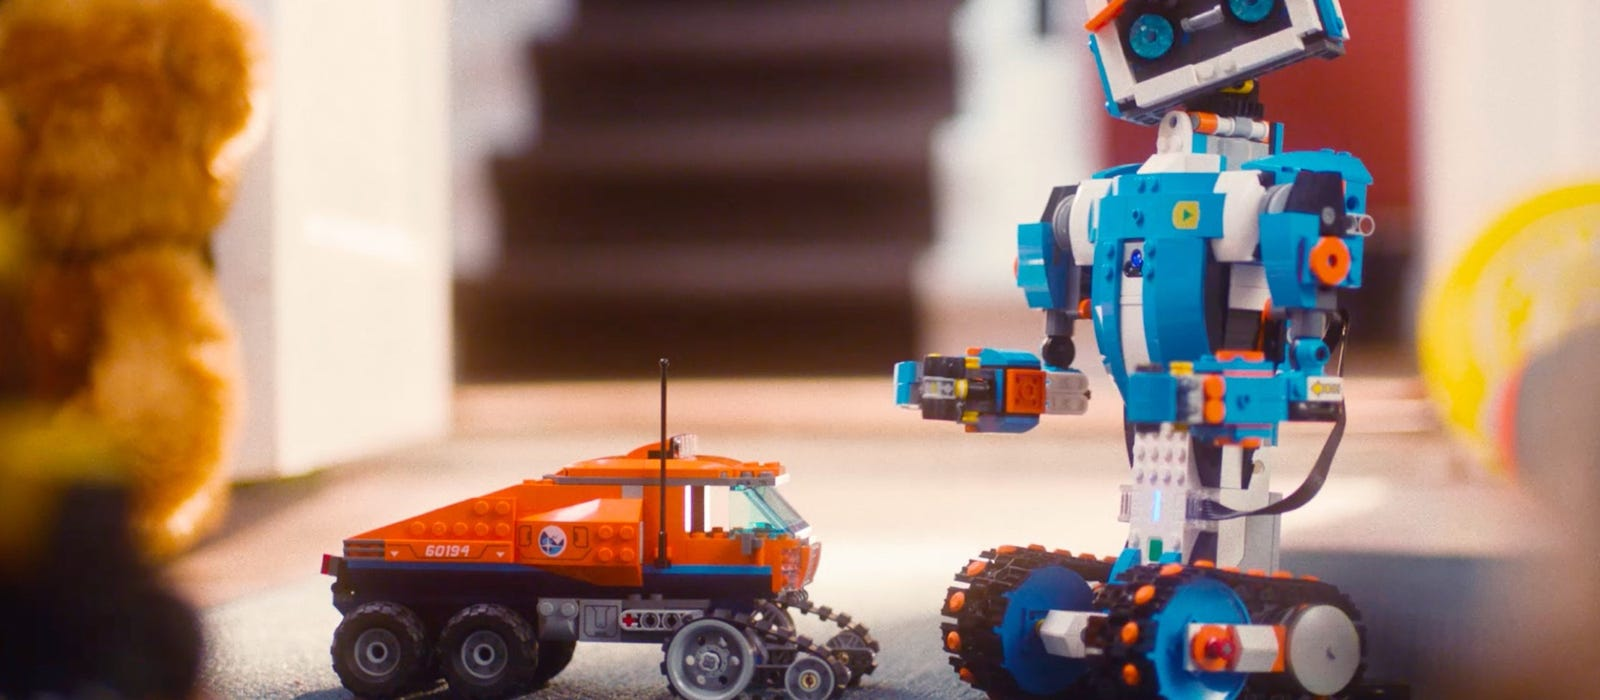 LEGO® BOOST Vernie robot standing